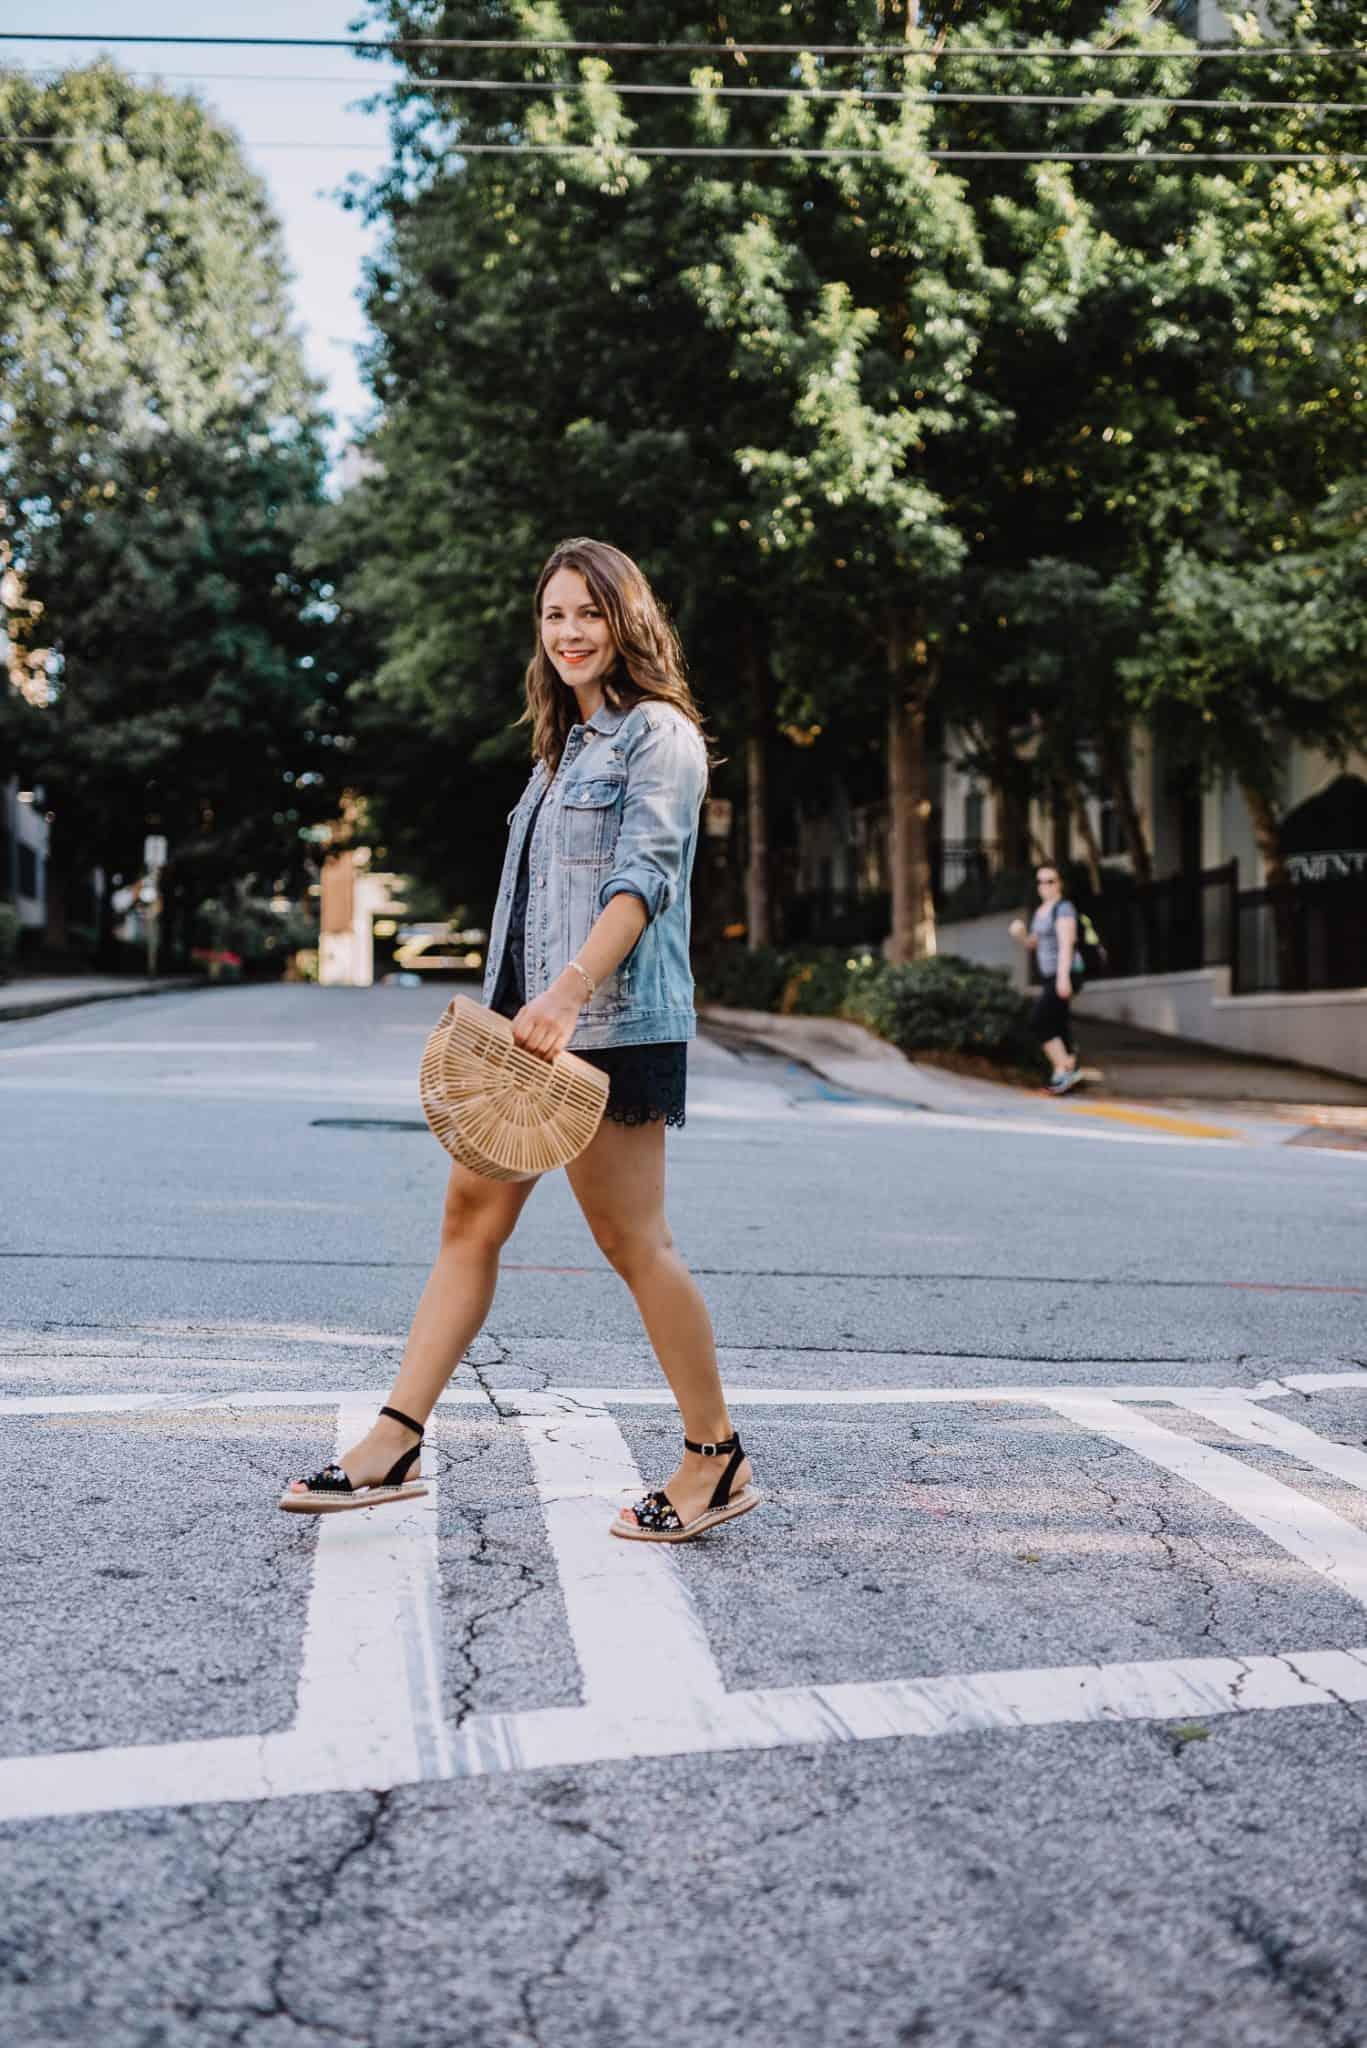 jessica camerata walking across the street in a denim jacket